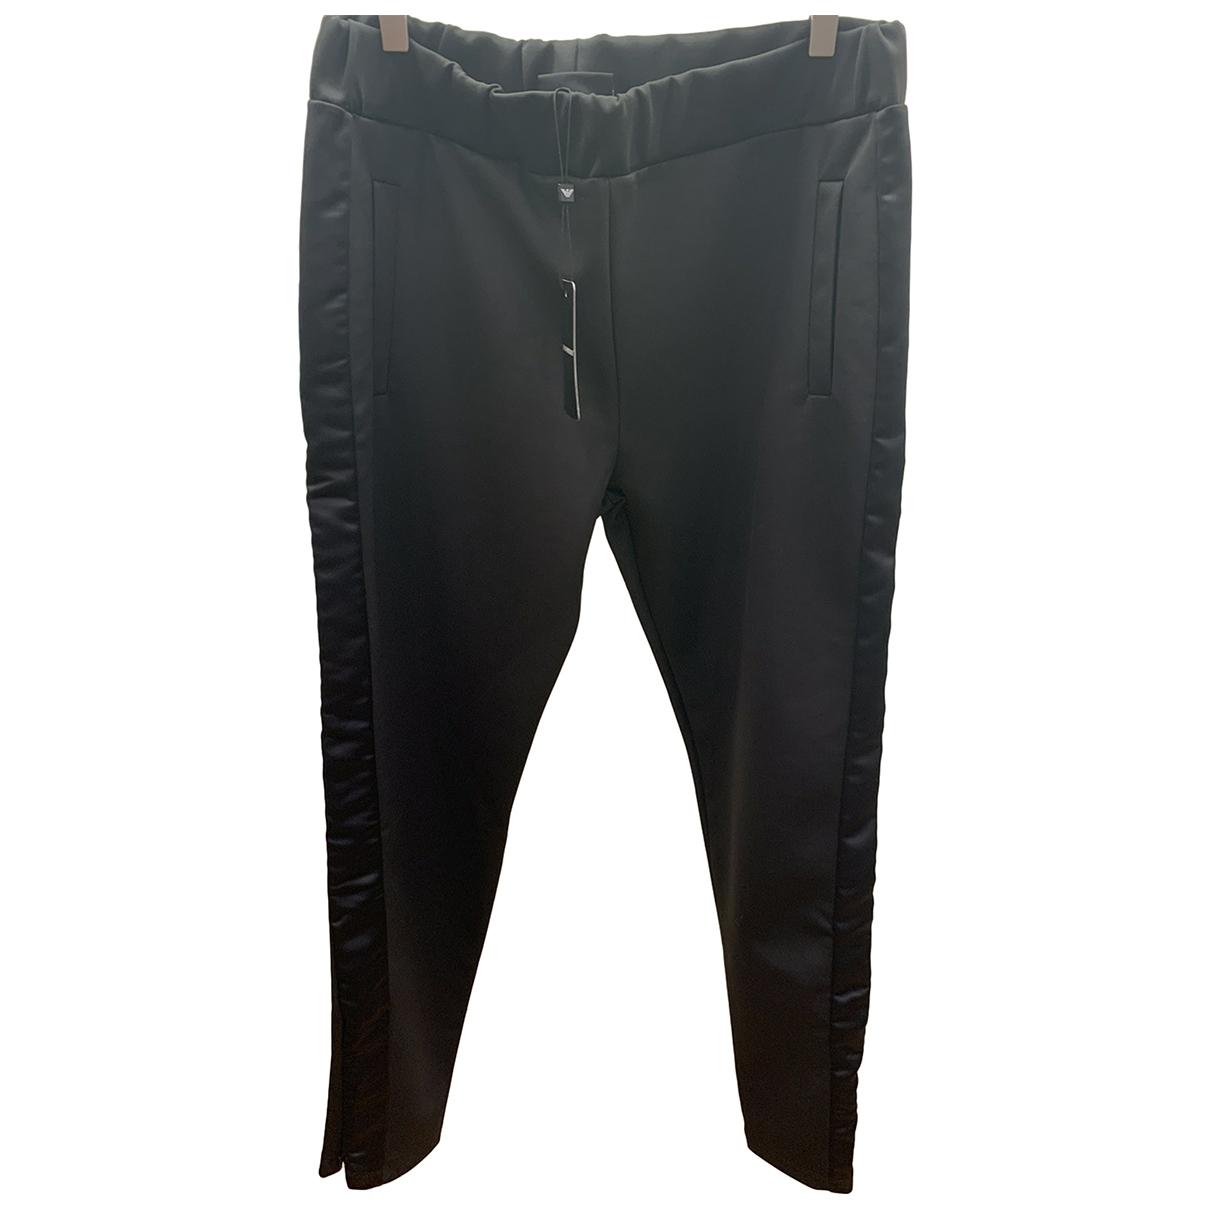 Emporio Armani \N Black Trousers for Women 46 IT